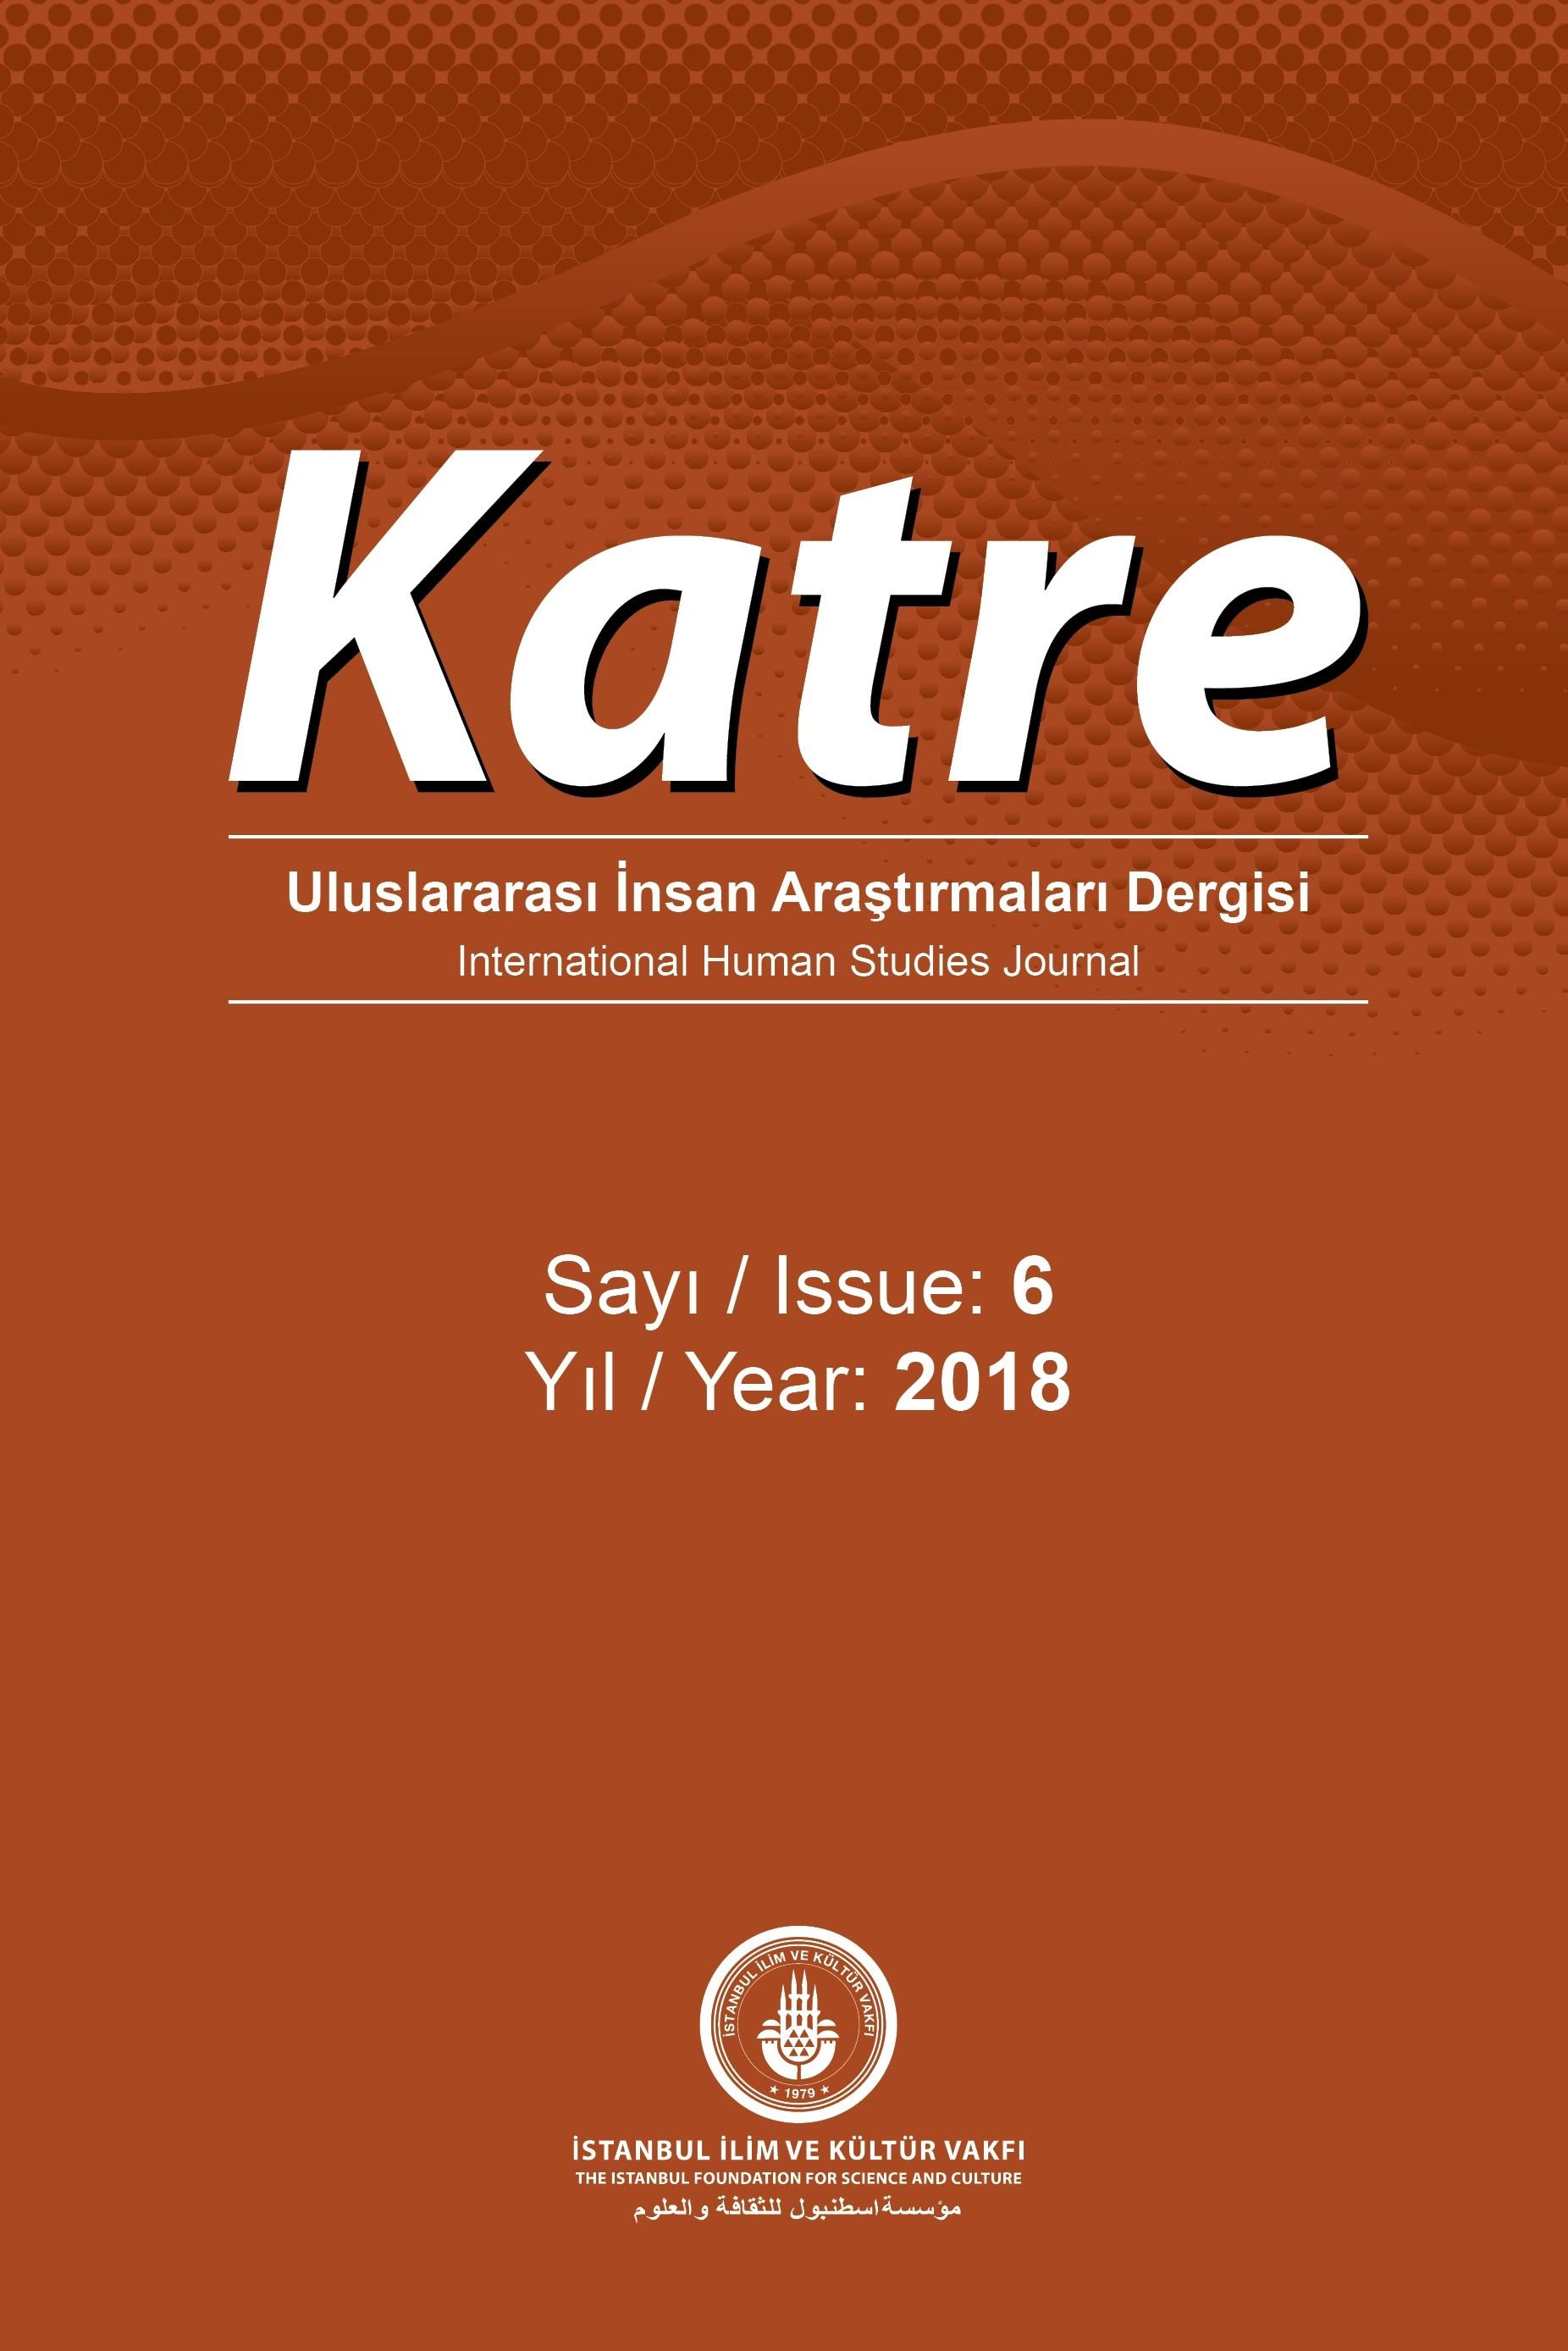 Katre International Human Studies Journal